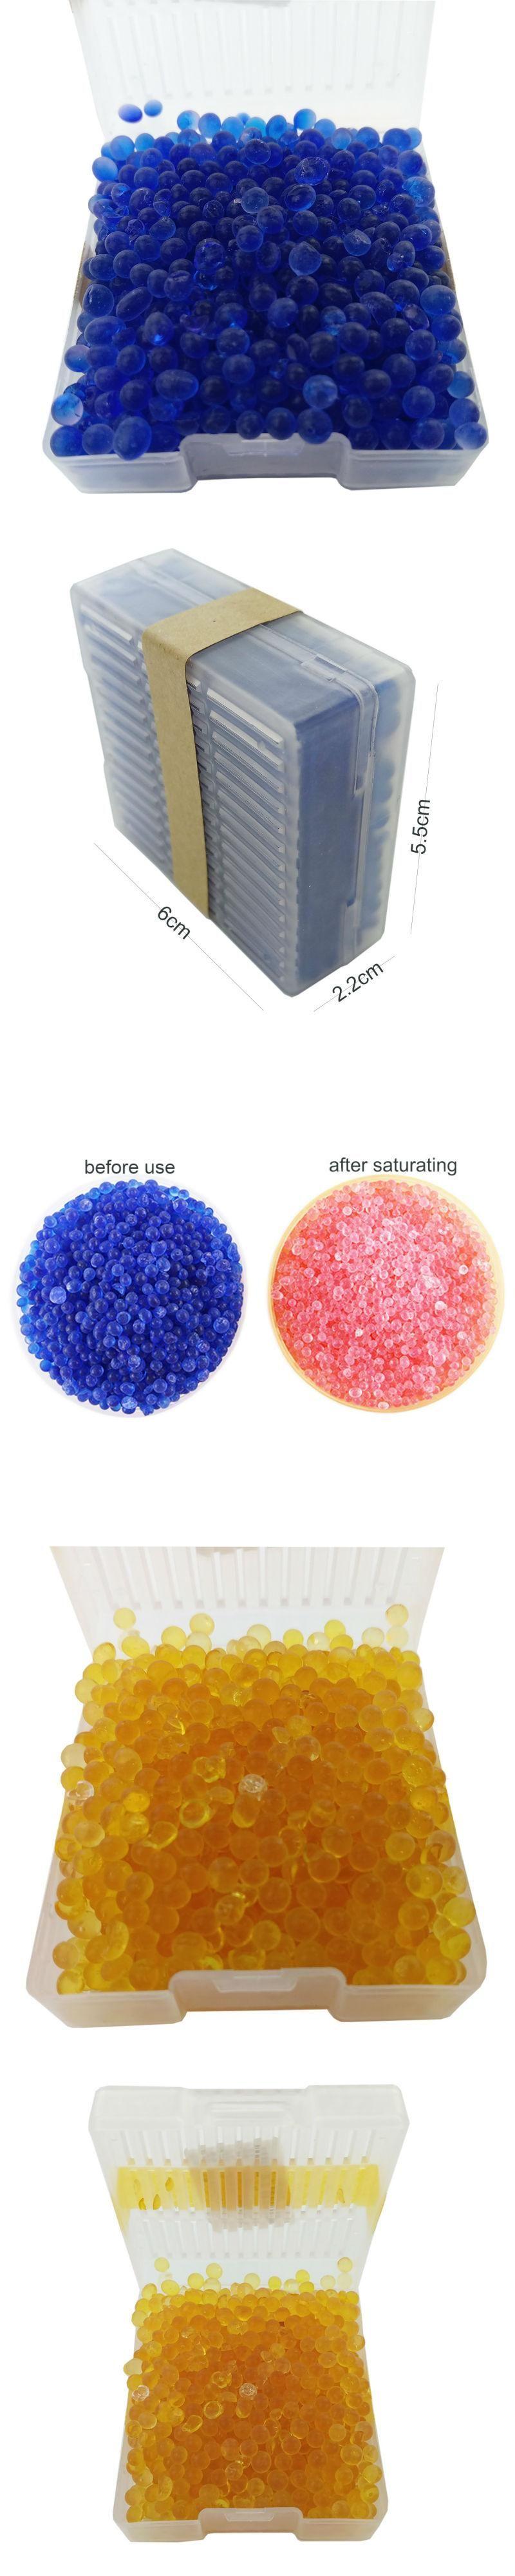 Orange Blue Silica Gel 60gincl Box Moisture Absorber Reusable Gell Silicagel Absorbent Desiccant